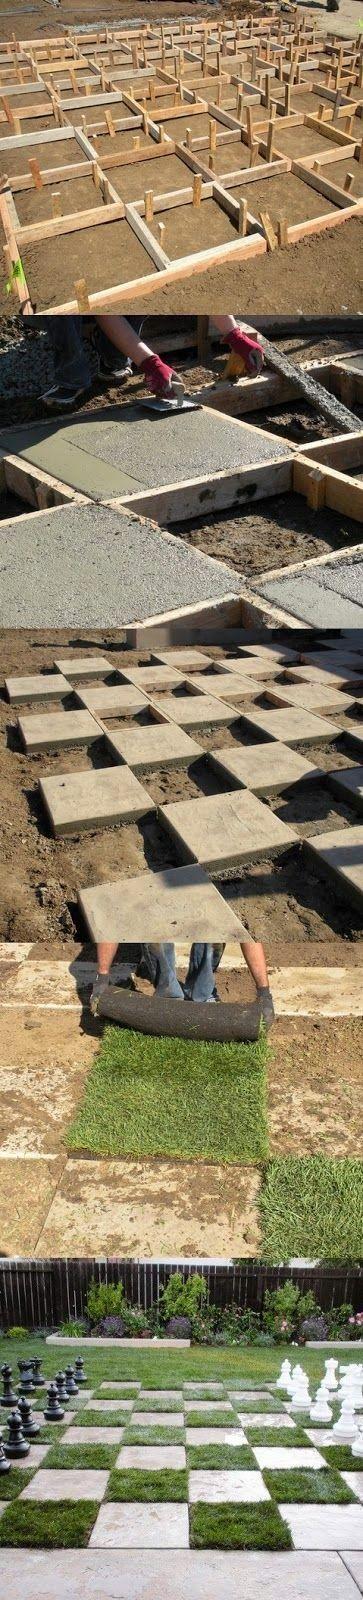 DIY - Make a Giant Chess Board In Your Backyard